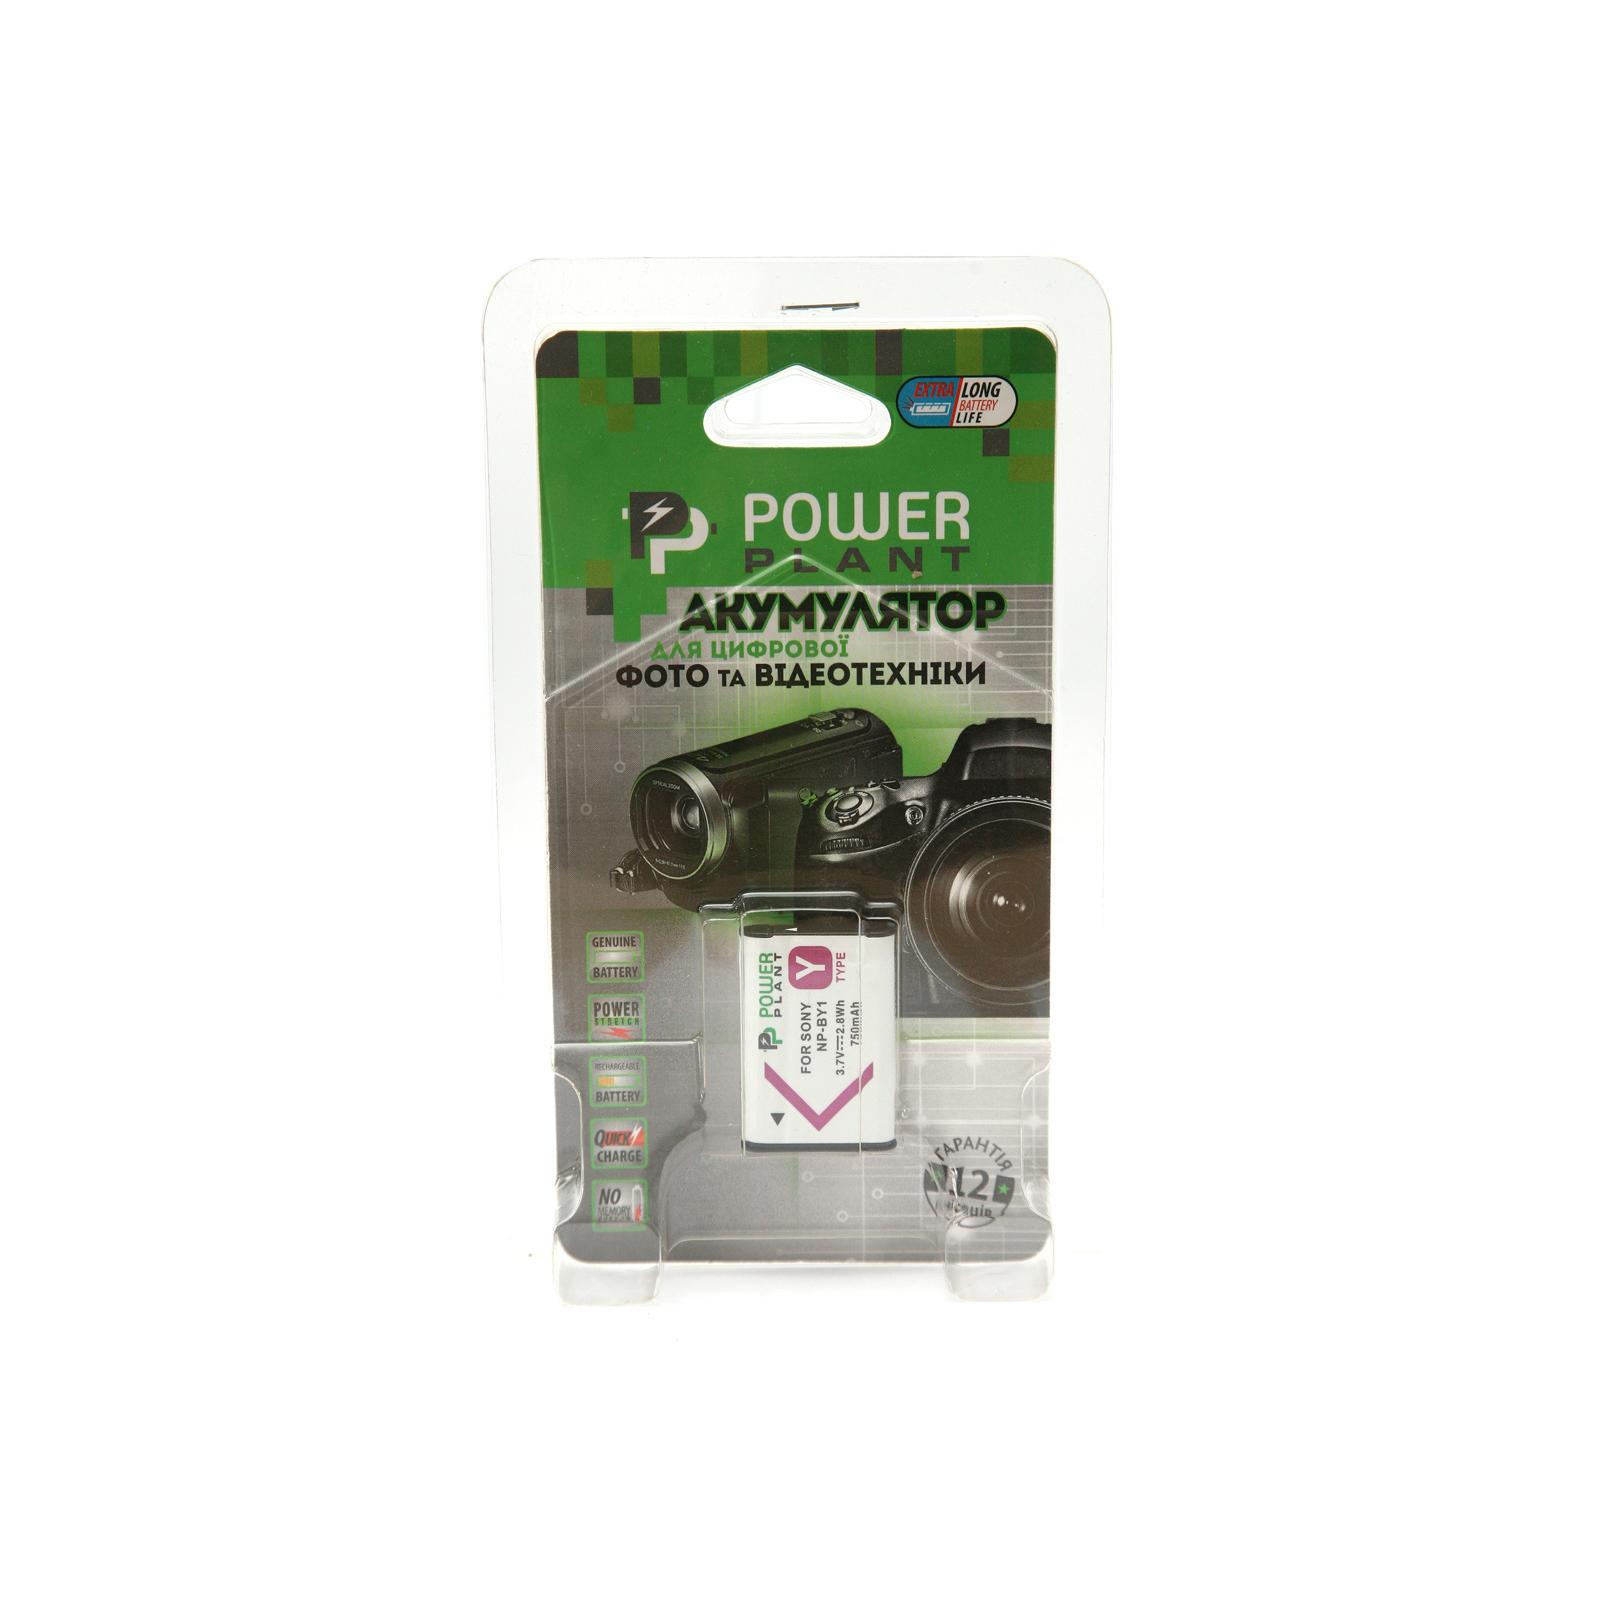 Аккумулятор к фото/видео PowerPlant Sony NP-BY1 (DV00DV1409) изображение 2